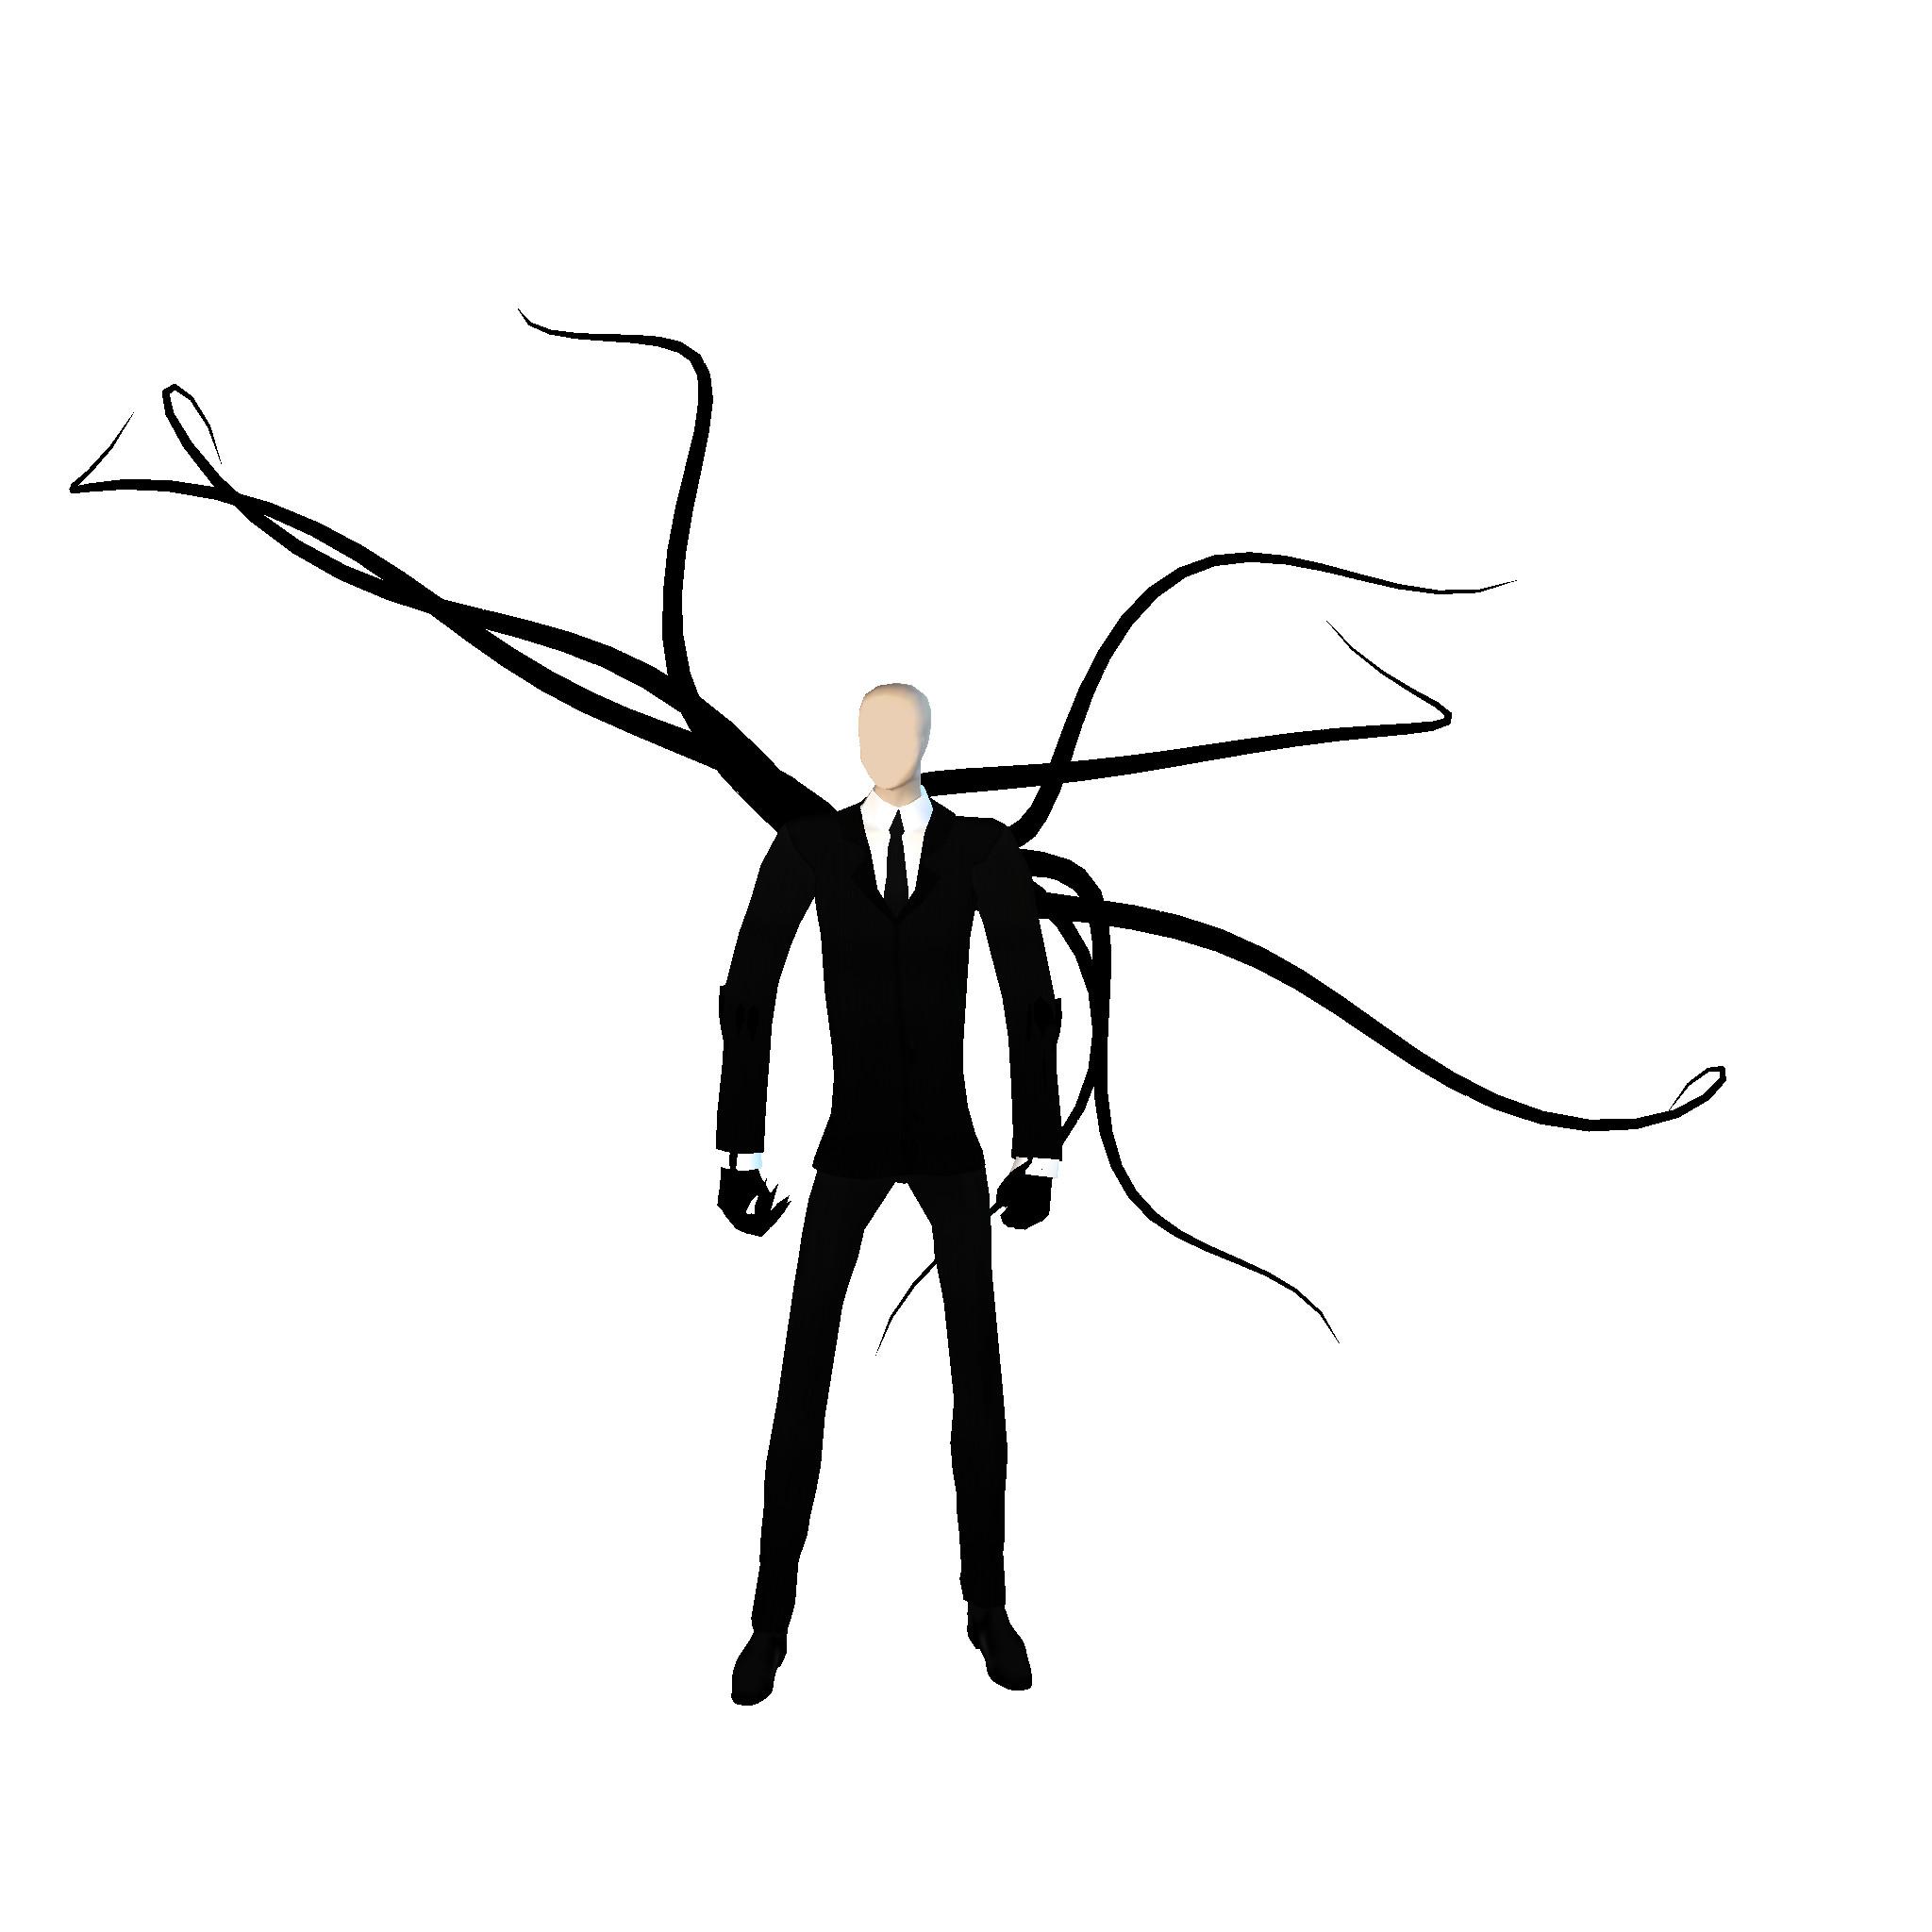 tentacle clipart The Slender Man Tentacle Horror Wallpaper #HD